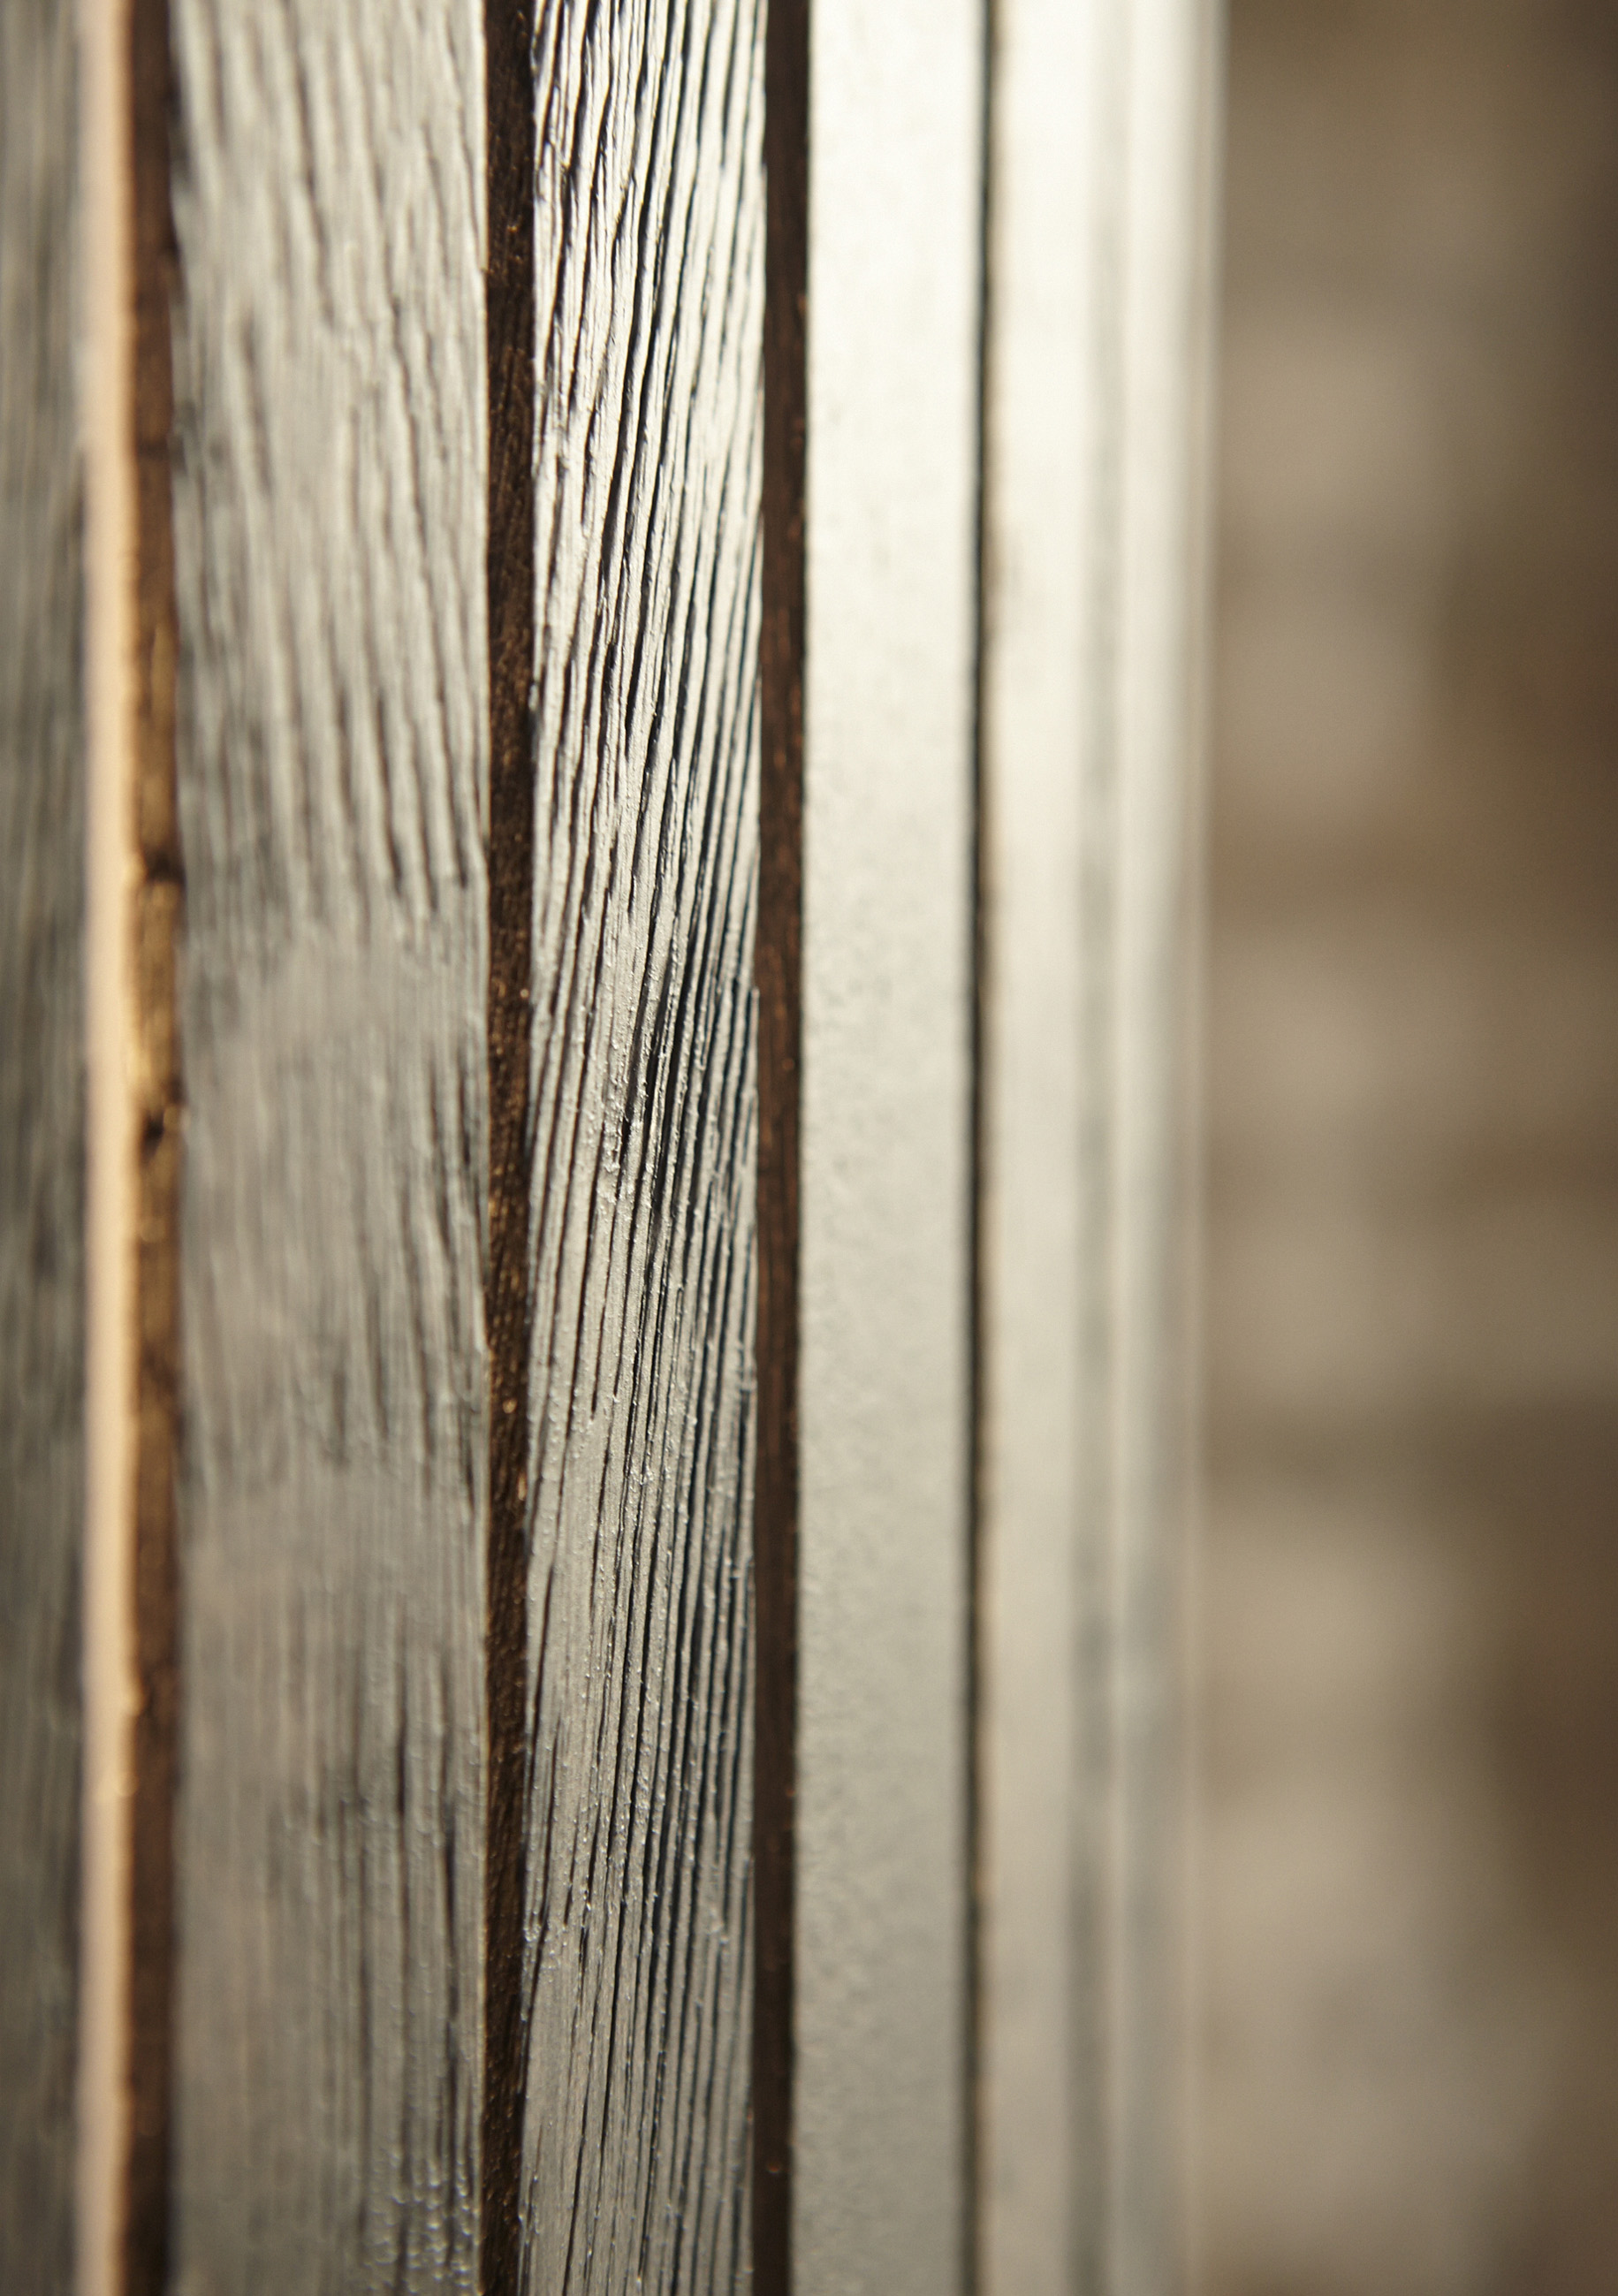 Fambuena Luz Oculta Wood Details